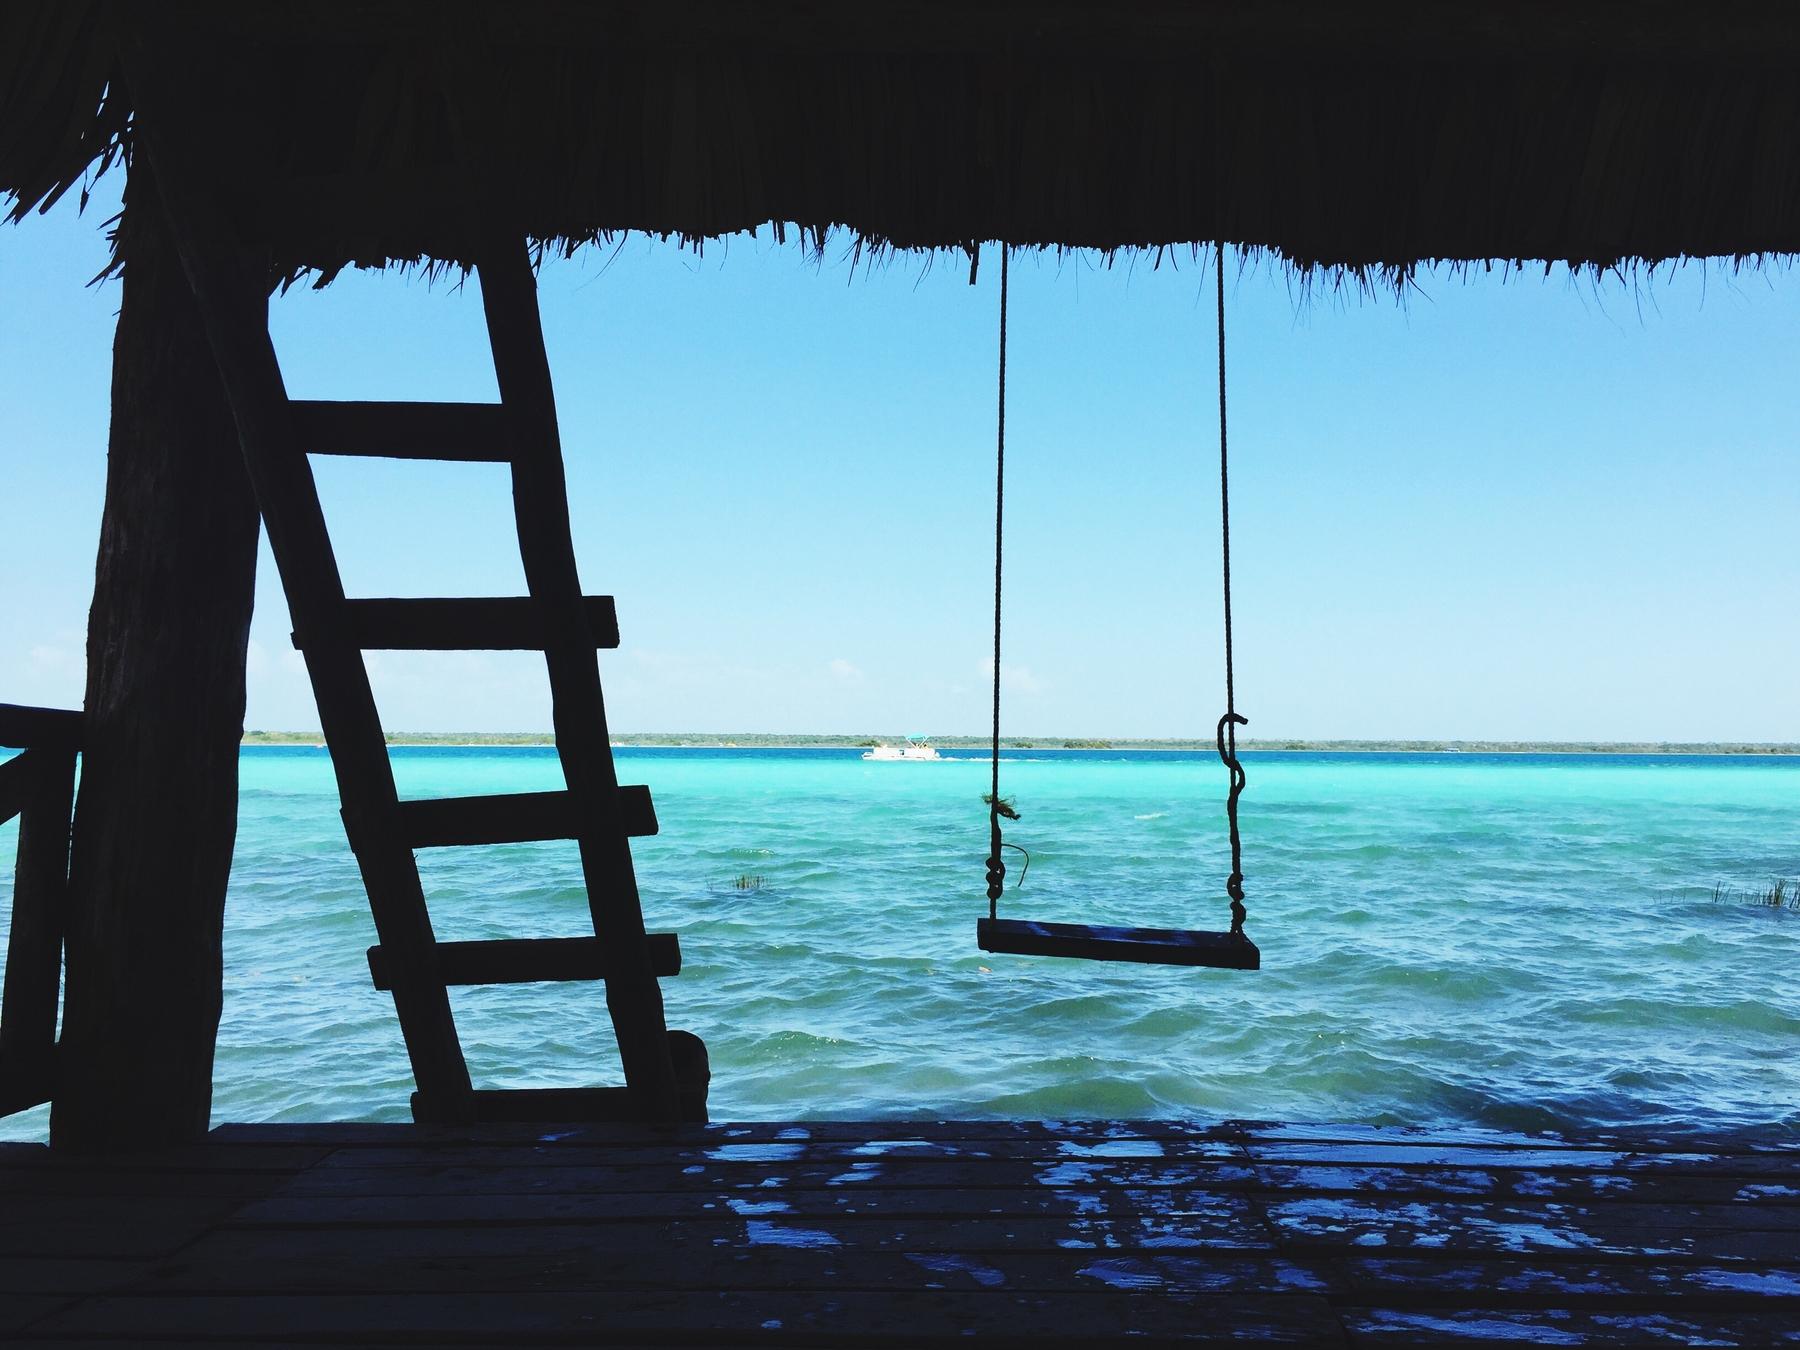 empty swing above water